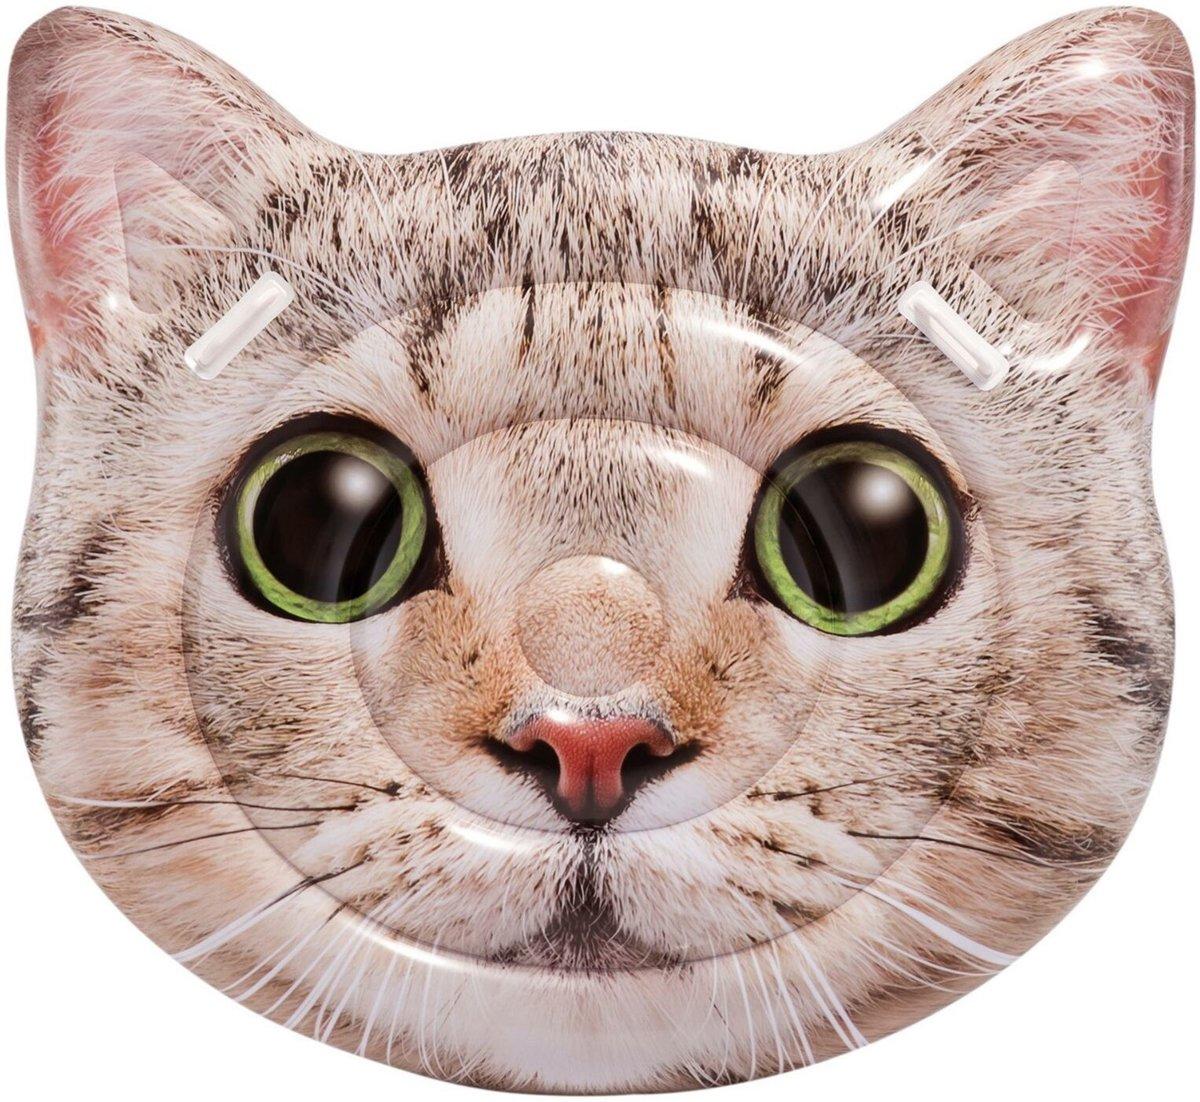 Intex Opblaasbare Kattengezicht 147 cm - Luchtbed